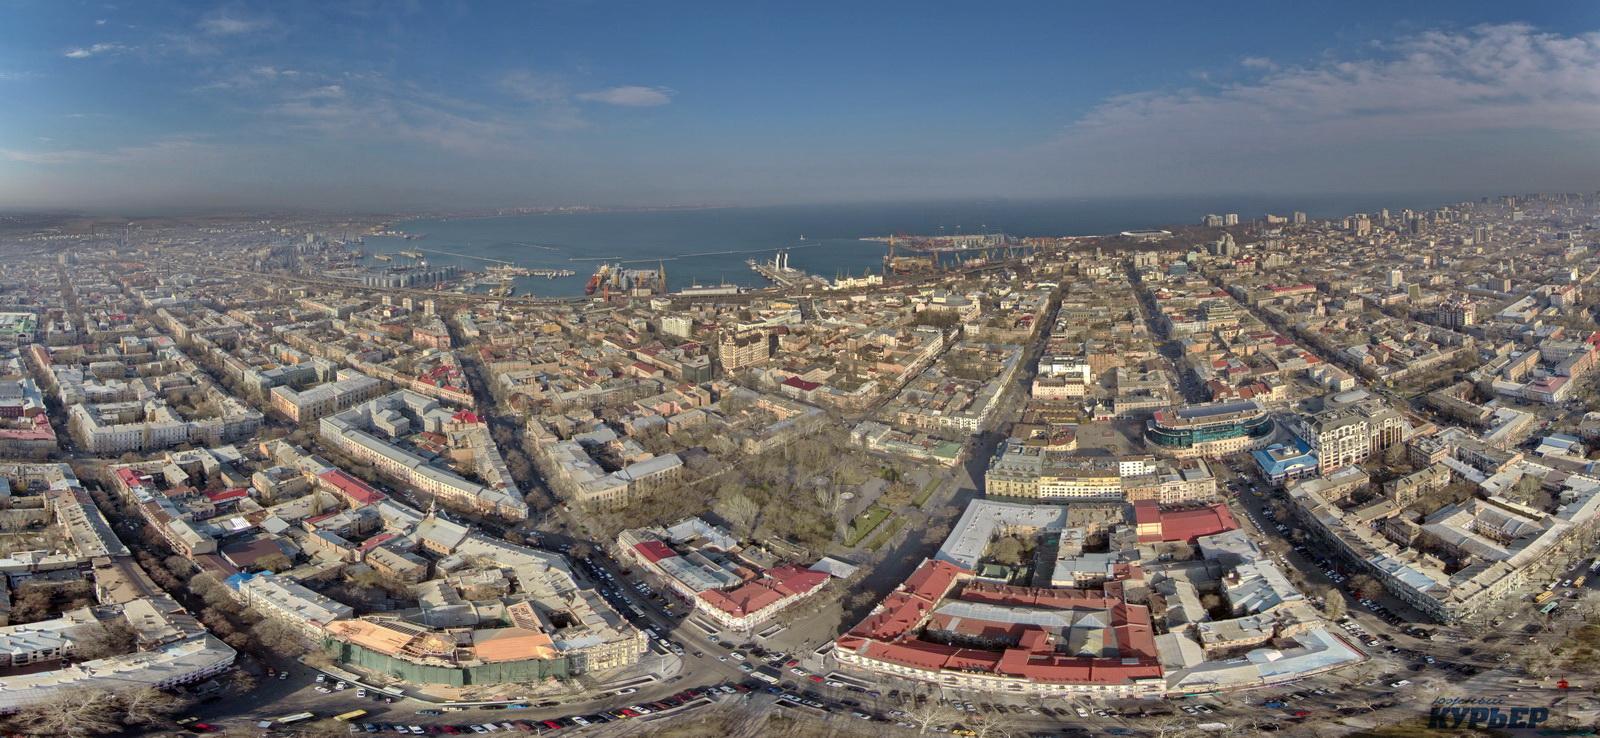 New MFC concept in Odessa